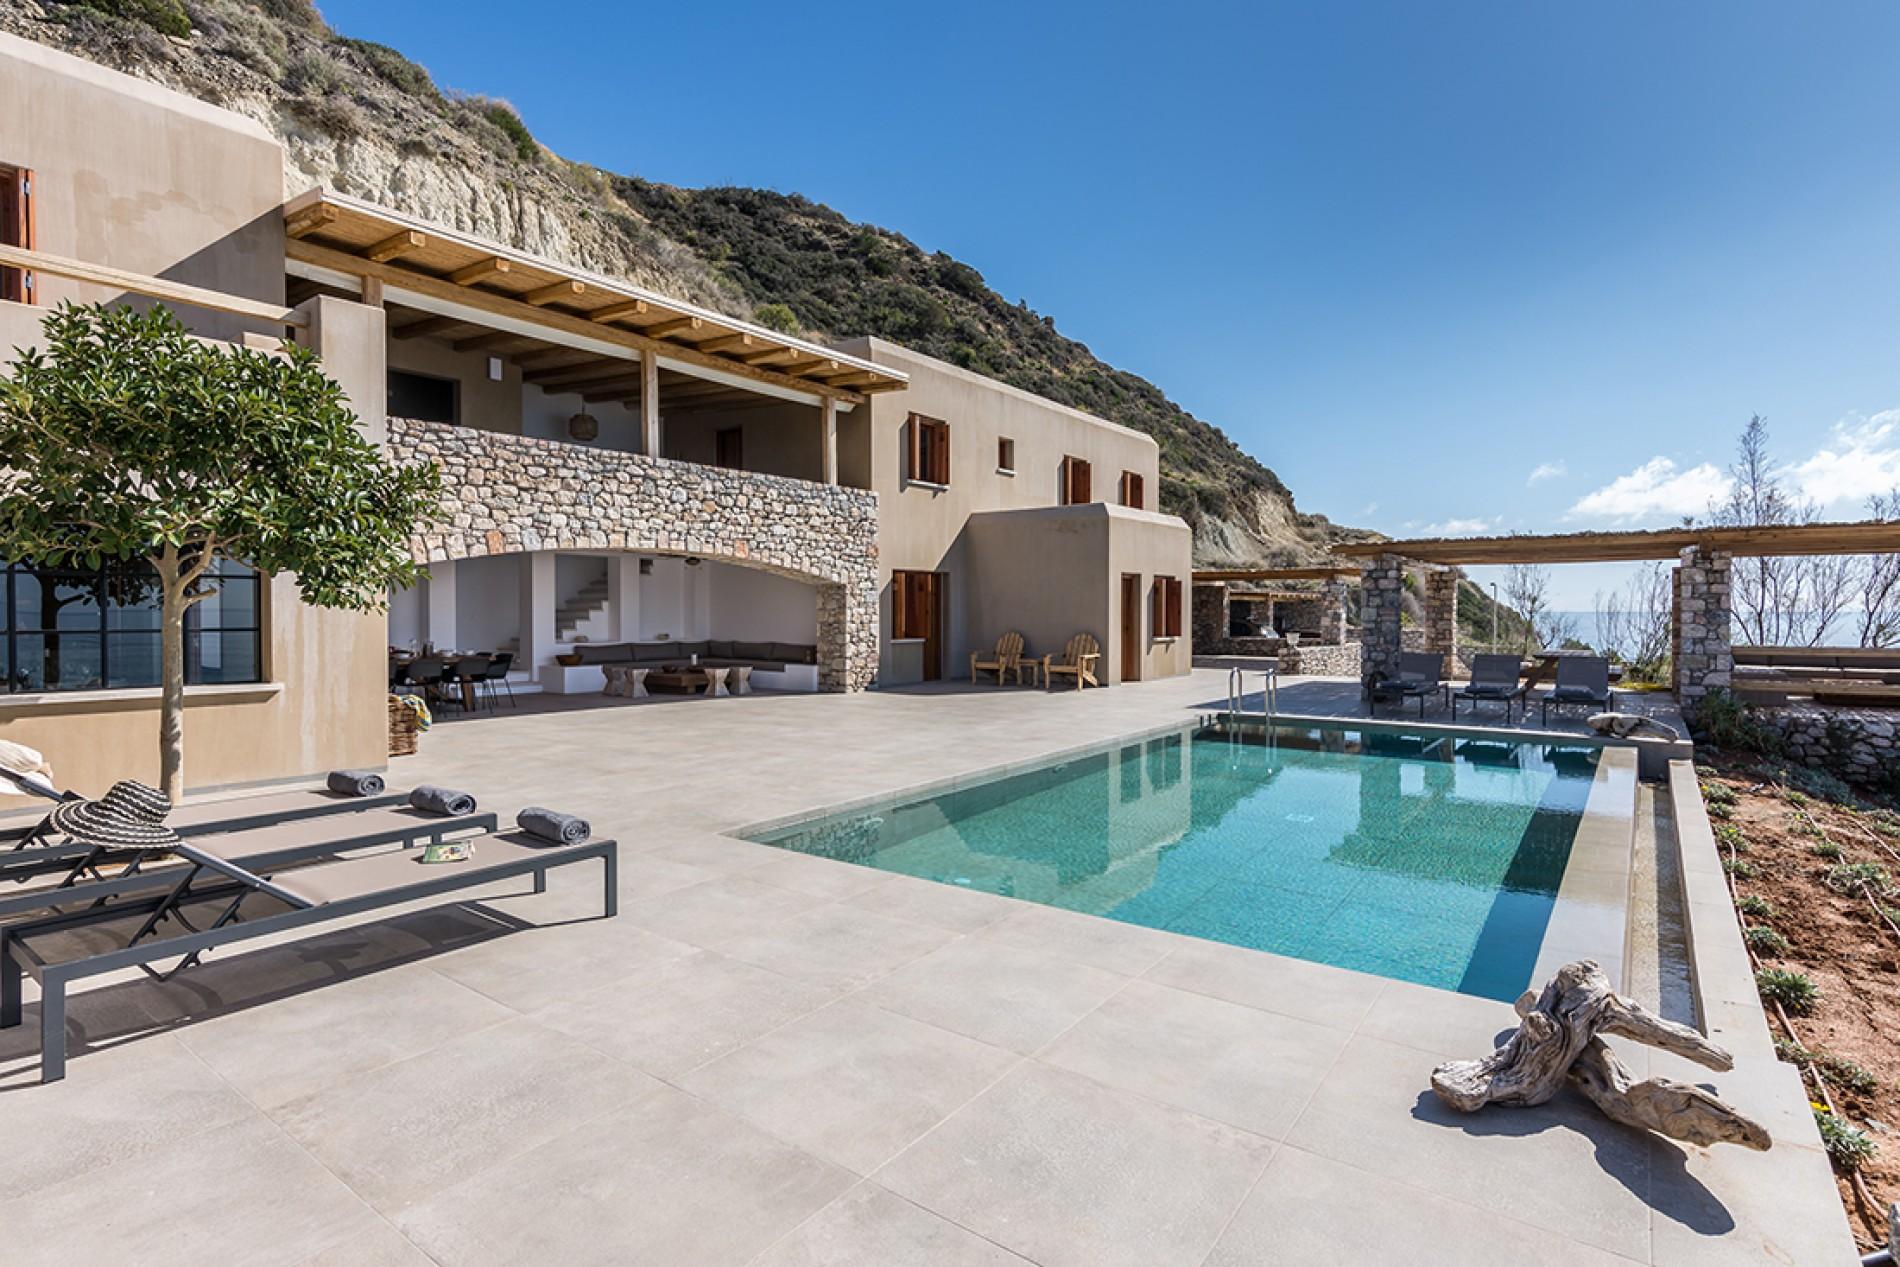 villa celia beachfront 12 bedrooms